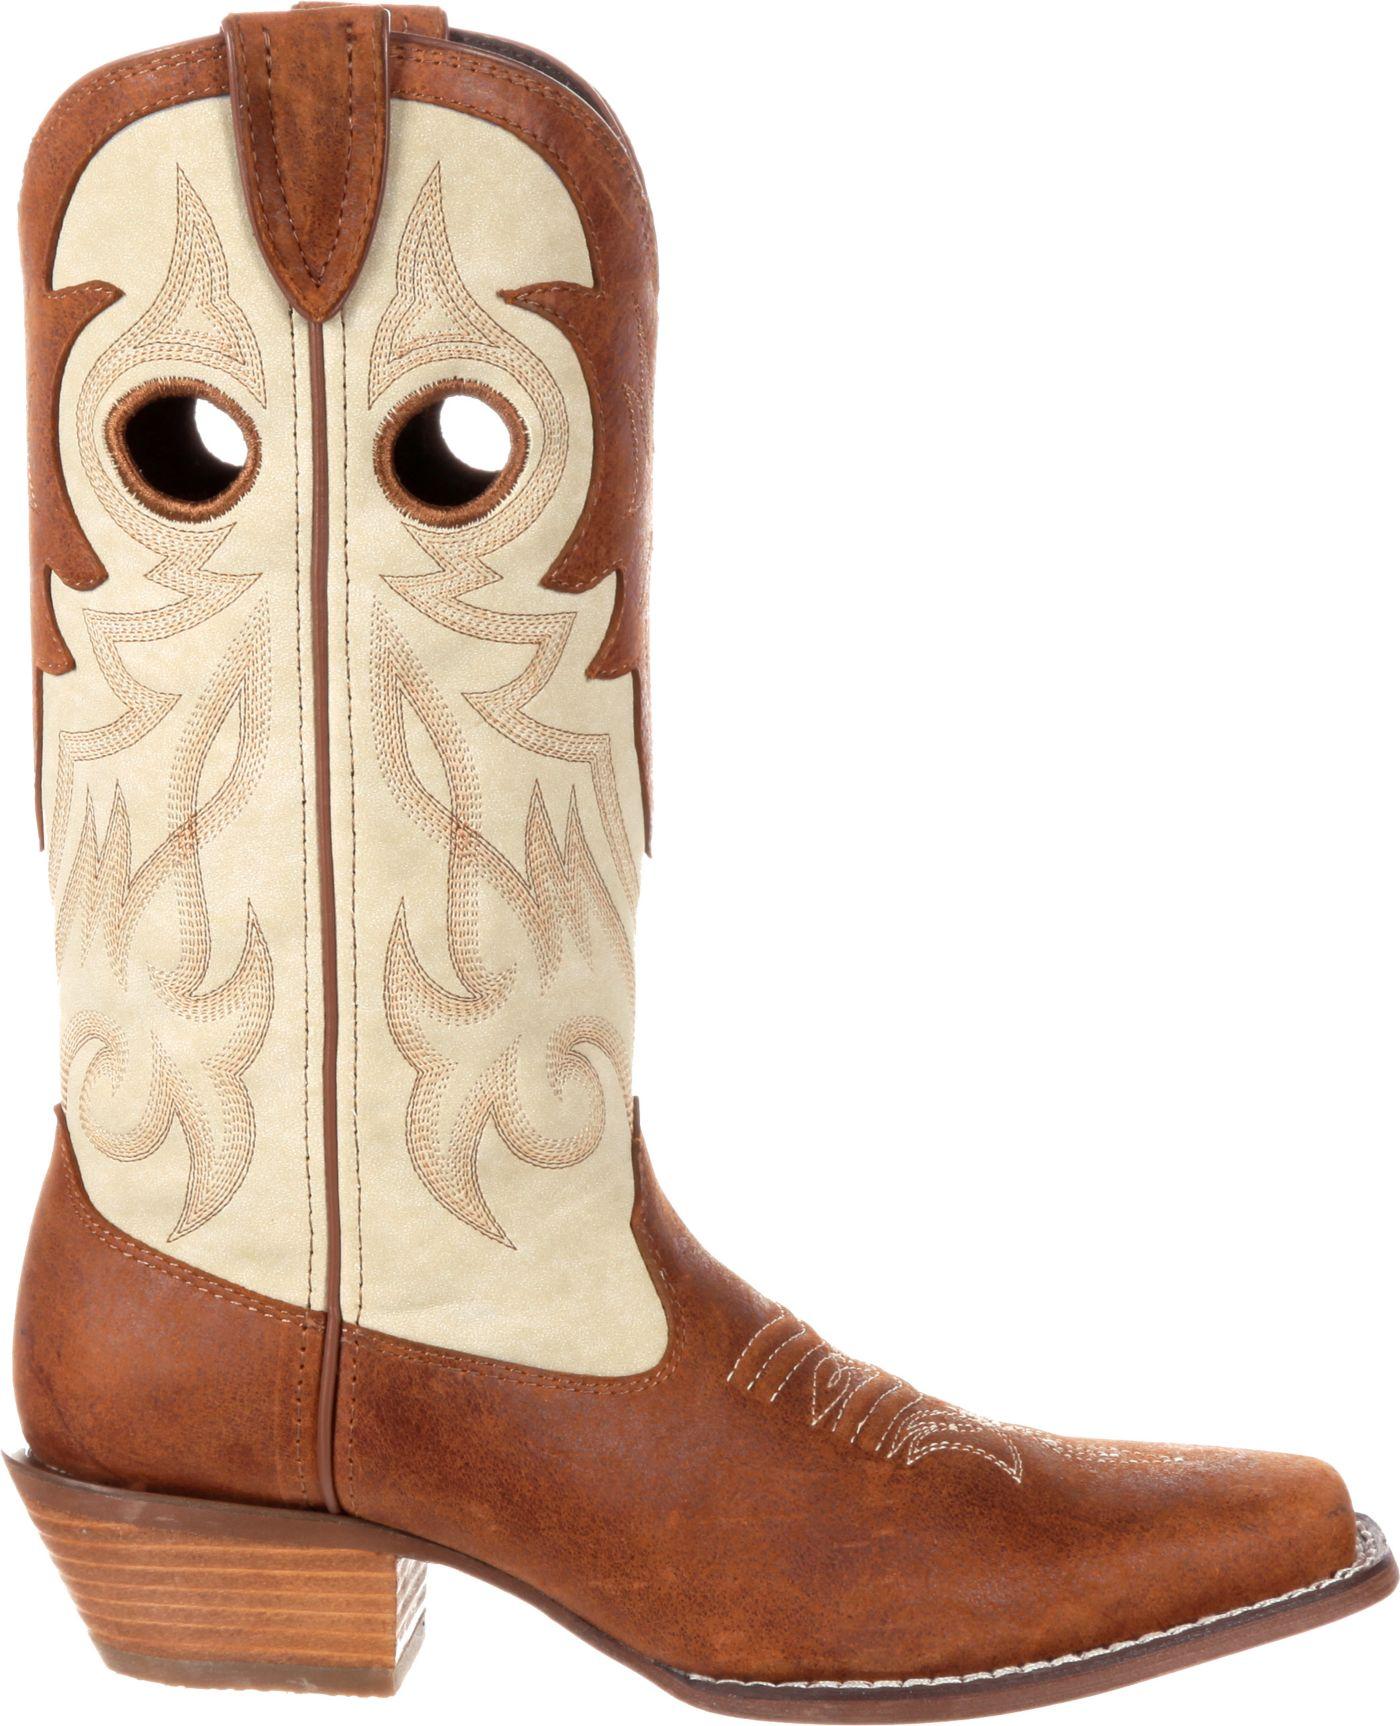 Durango Women's Crush Collar Western Boots